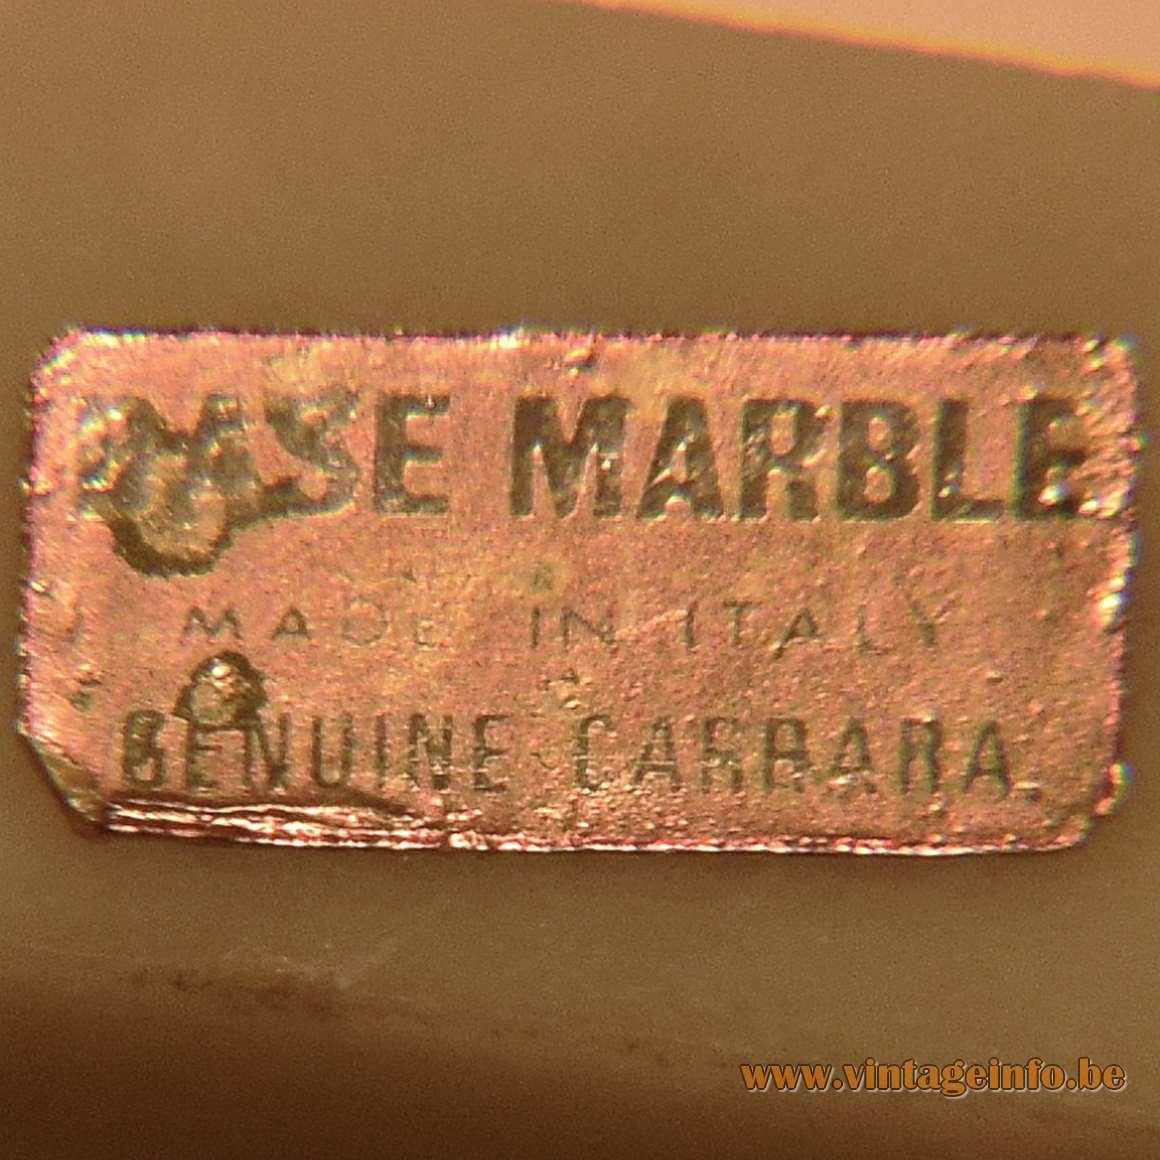 Queen Conch table lamp brass rod Carara marble base Bakelite socket 1970s lobatus gigas souvenir 1960s